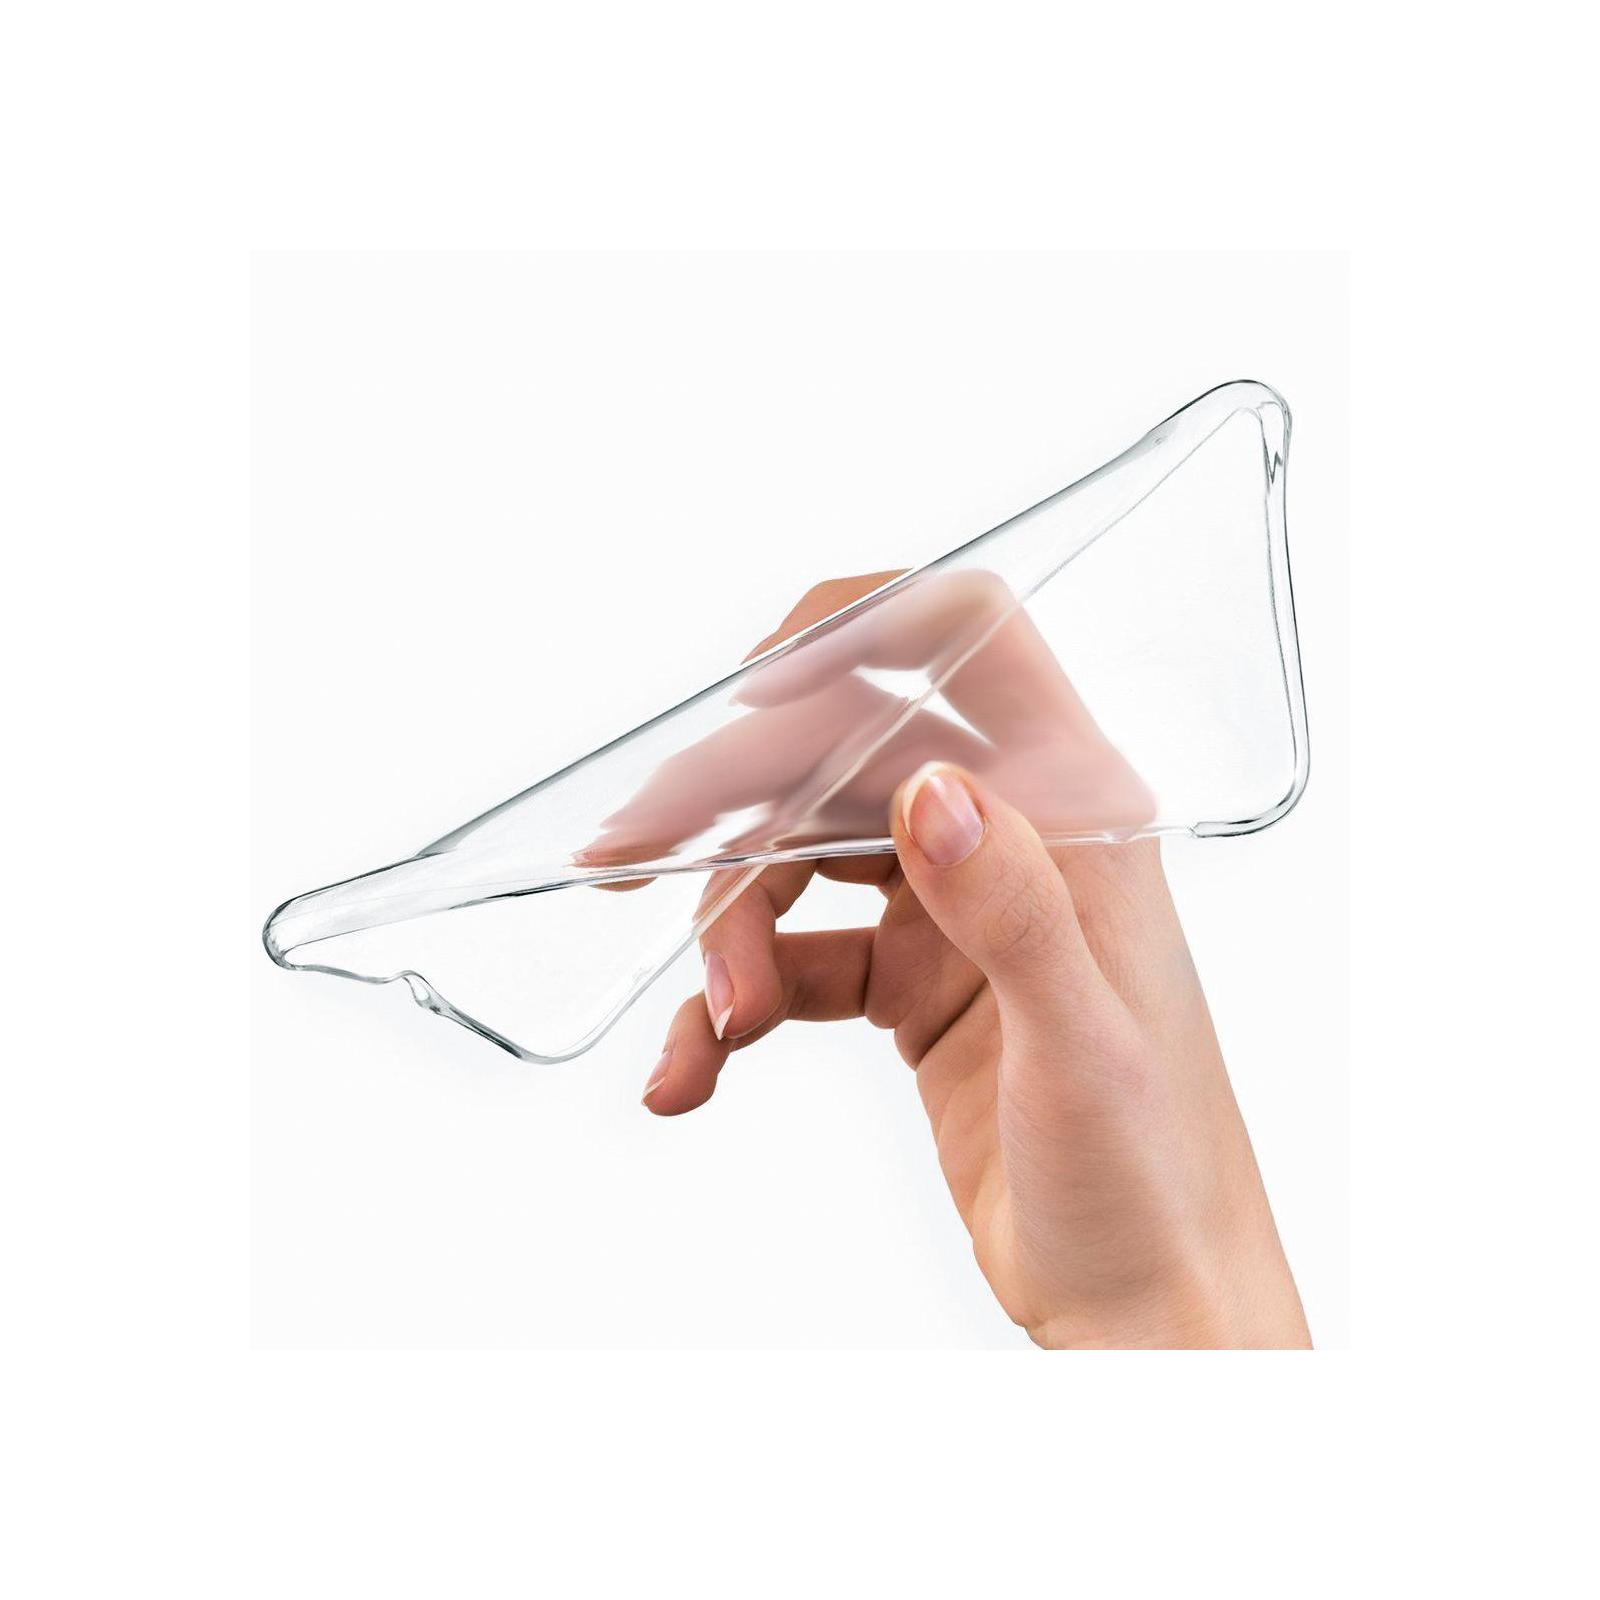 Чехол для моб. телефона SmartCase Samsung Galaxy J3 /J330 TPU Clear (SC-J330) изображение 4